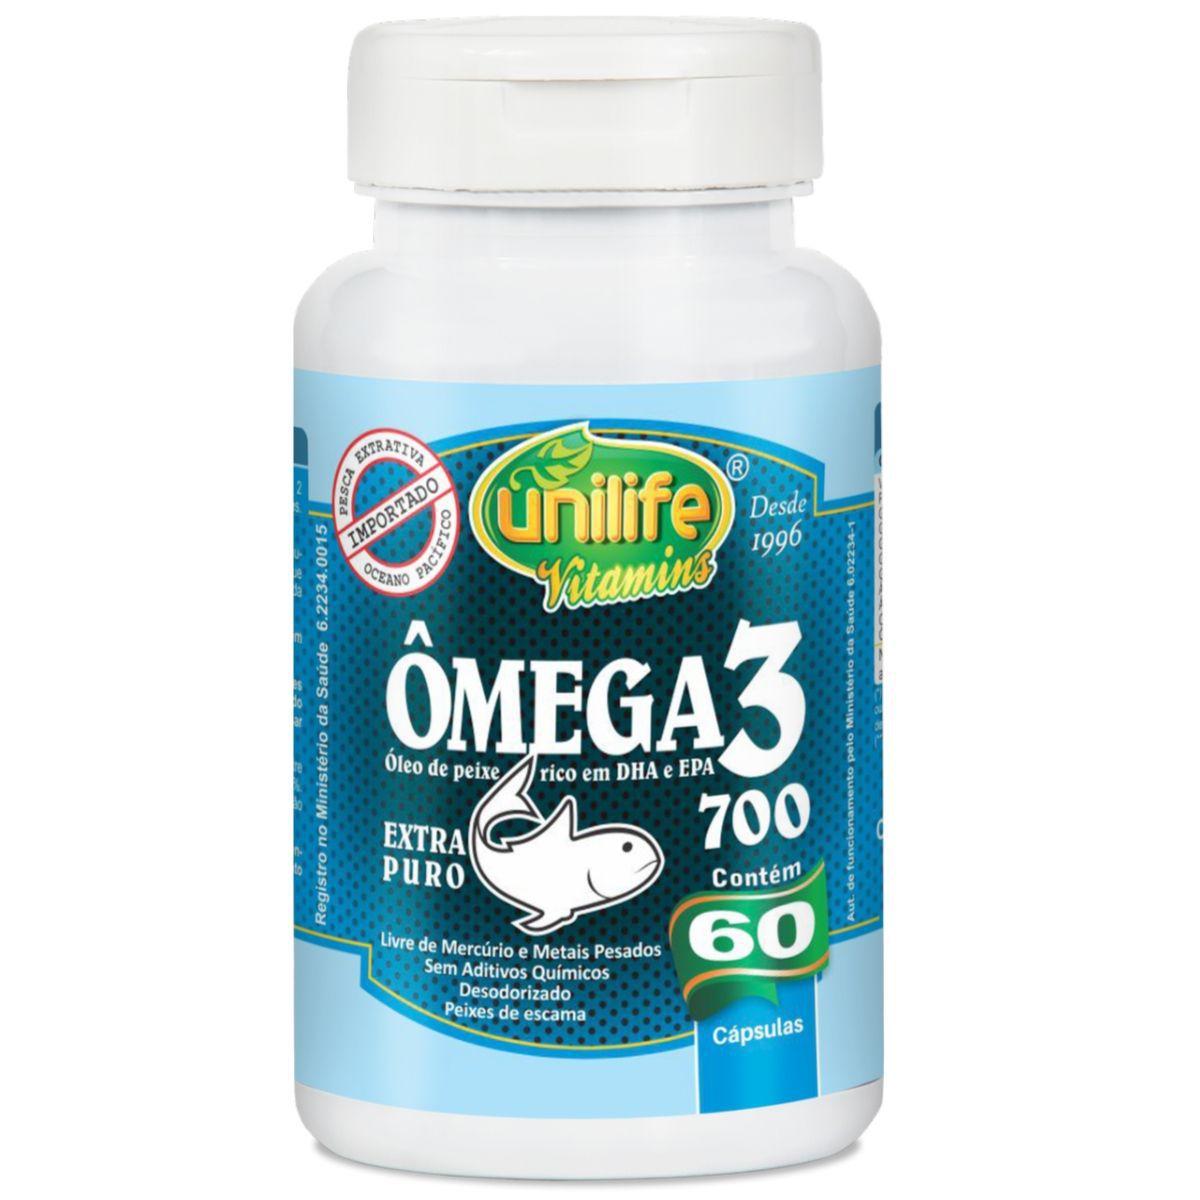 Ômega 3 Óleo de Peixe 60 Cápsulas 700mg - Unilife